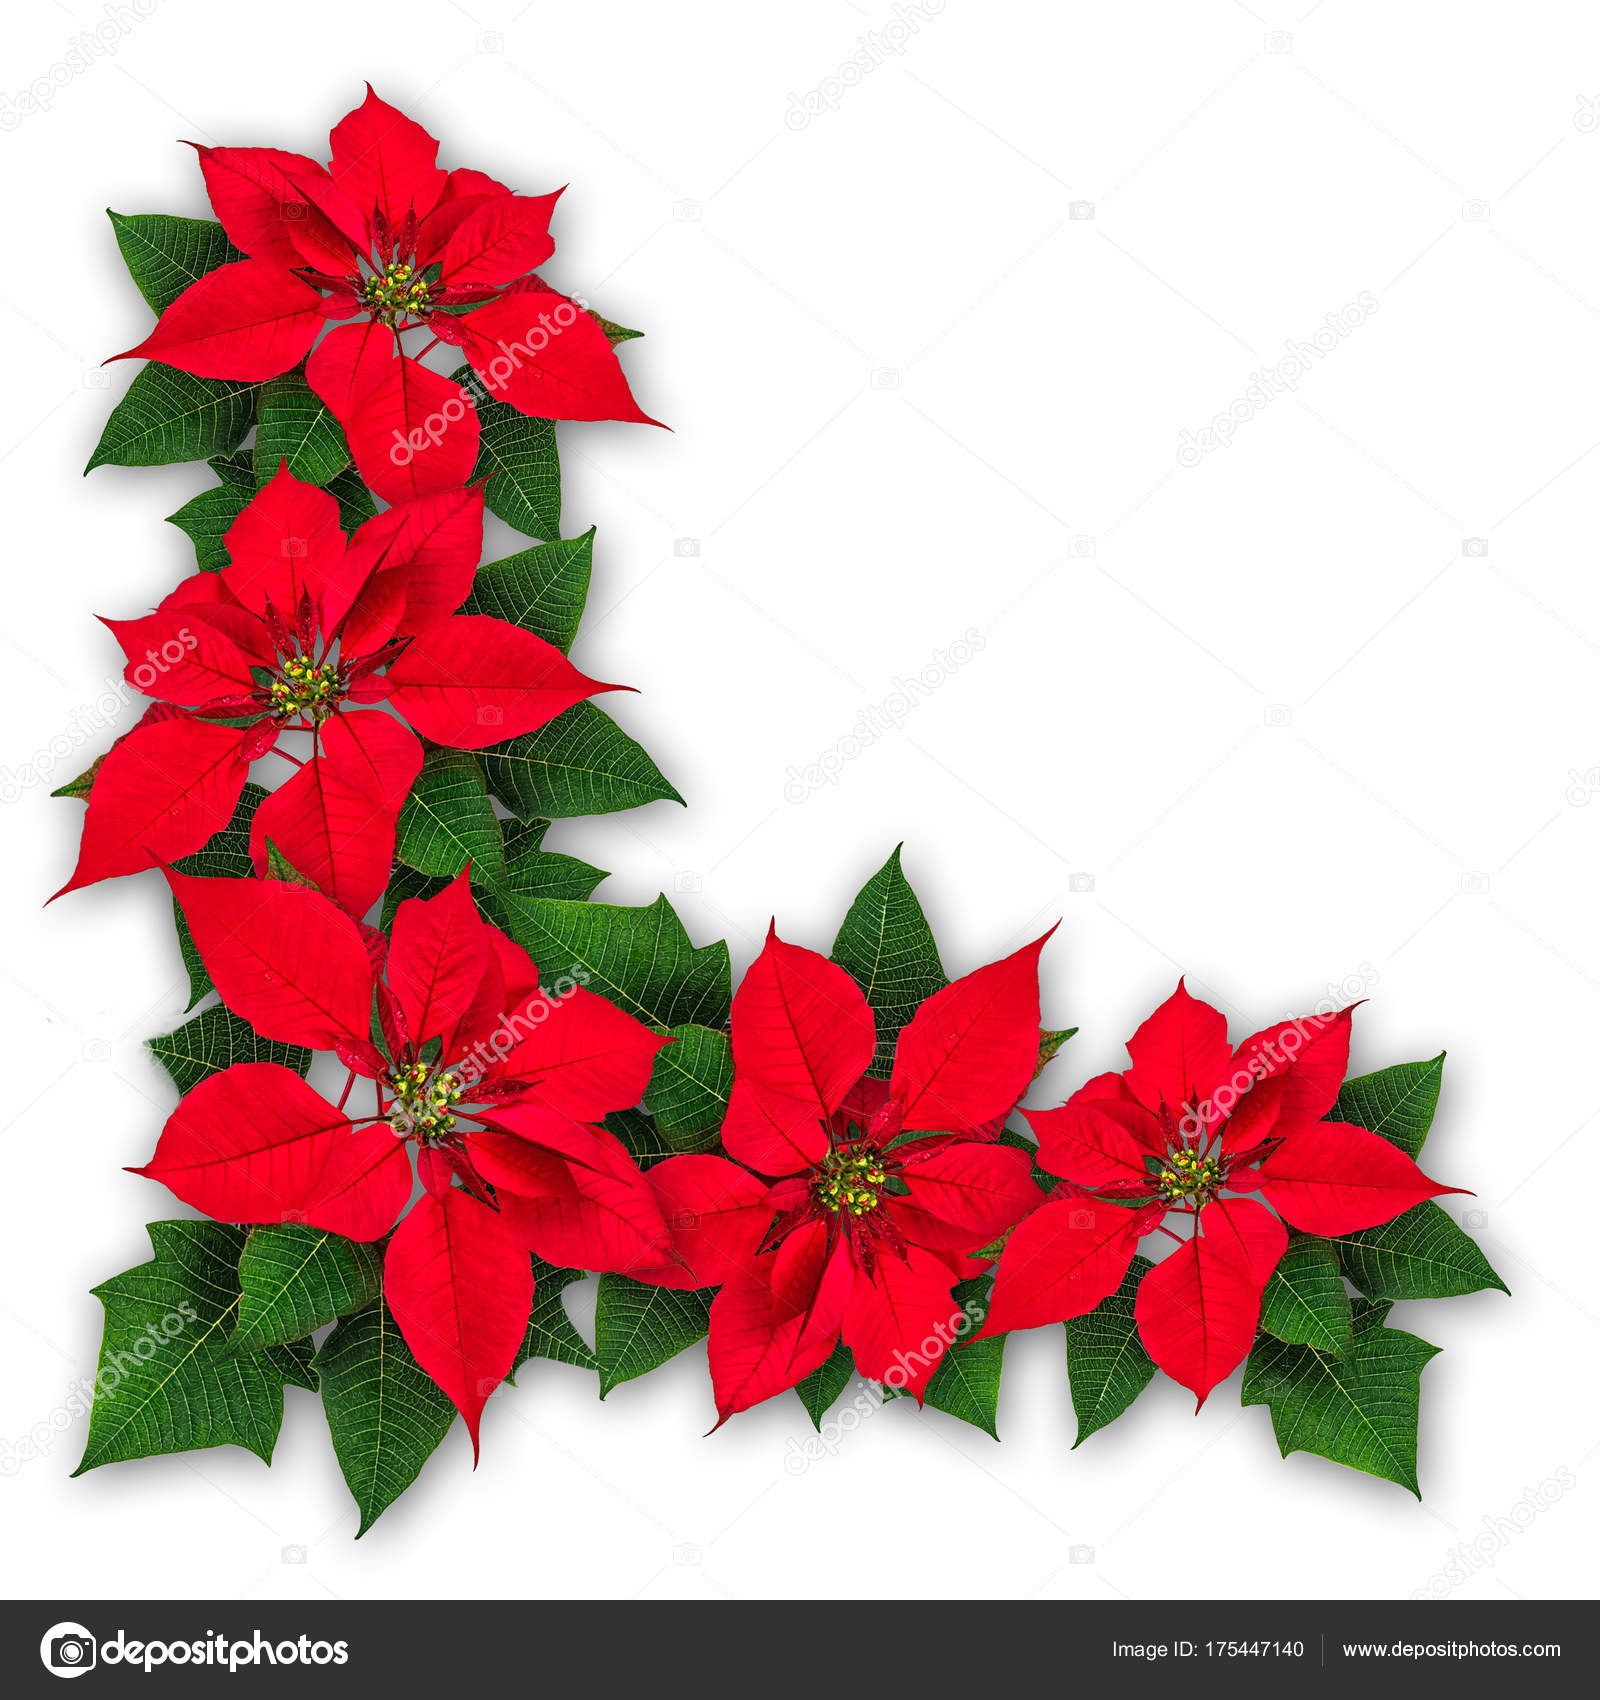 Poinsettia Flowers Christmas Decoration Stock Photo C Agcuesta1 175447140